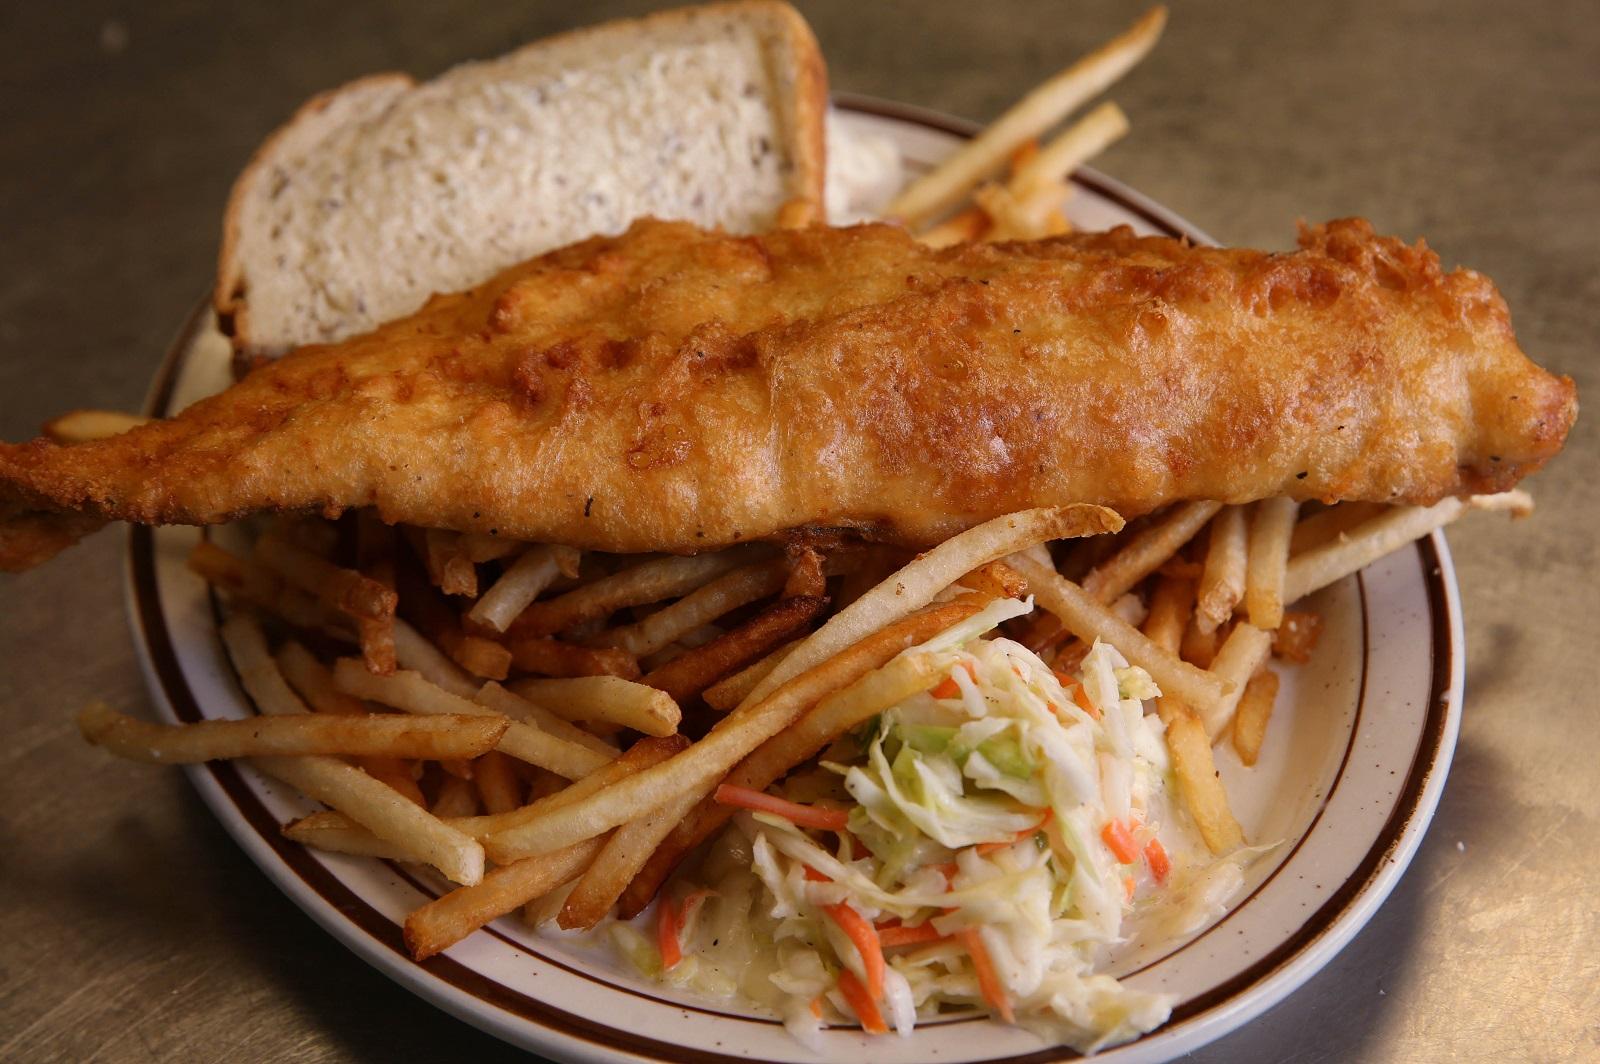 Wiechec's beer-battered haddock fish fry. (Sharon Cantillon/Buffalo News)